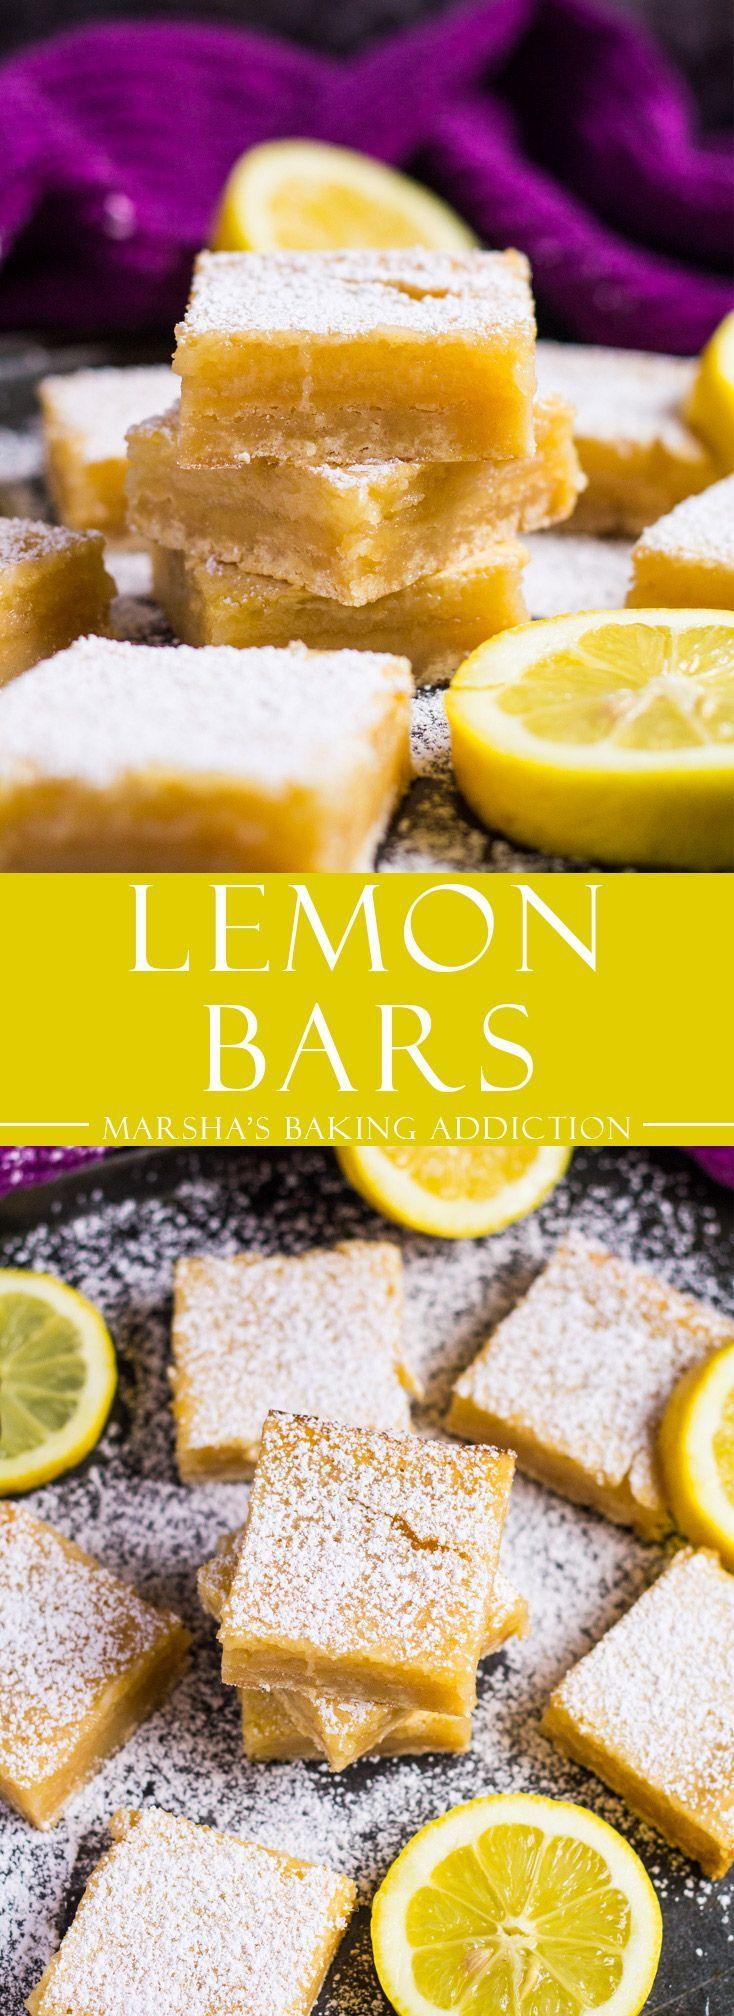 Lemon Bars | http://marshasbakingaddiction.com /marshasbakeblog/